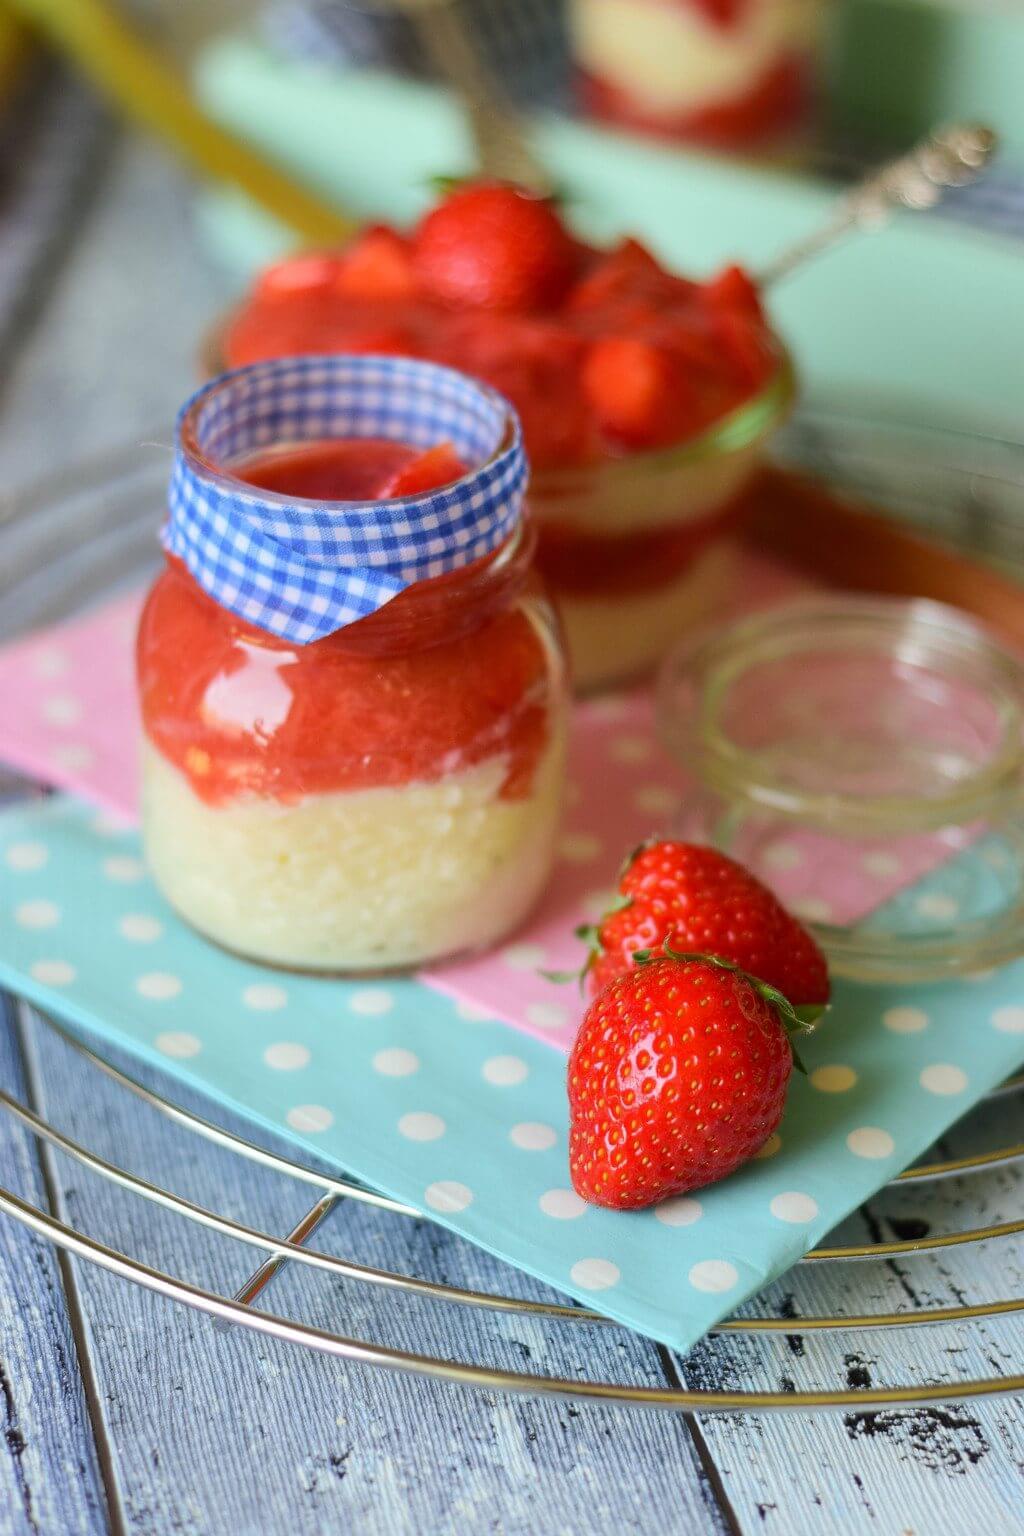 Grießbrei mit Erdbeer Rhabarber Kompott